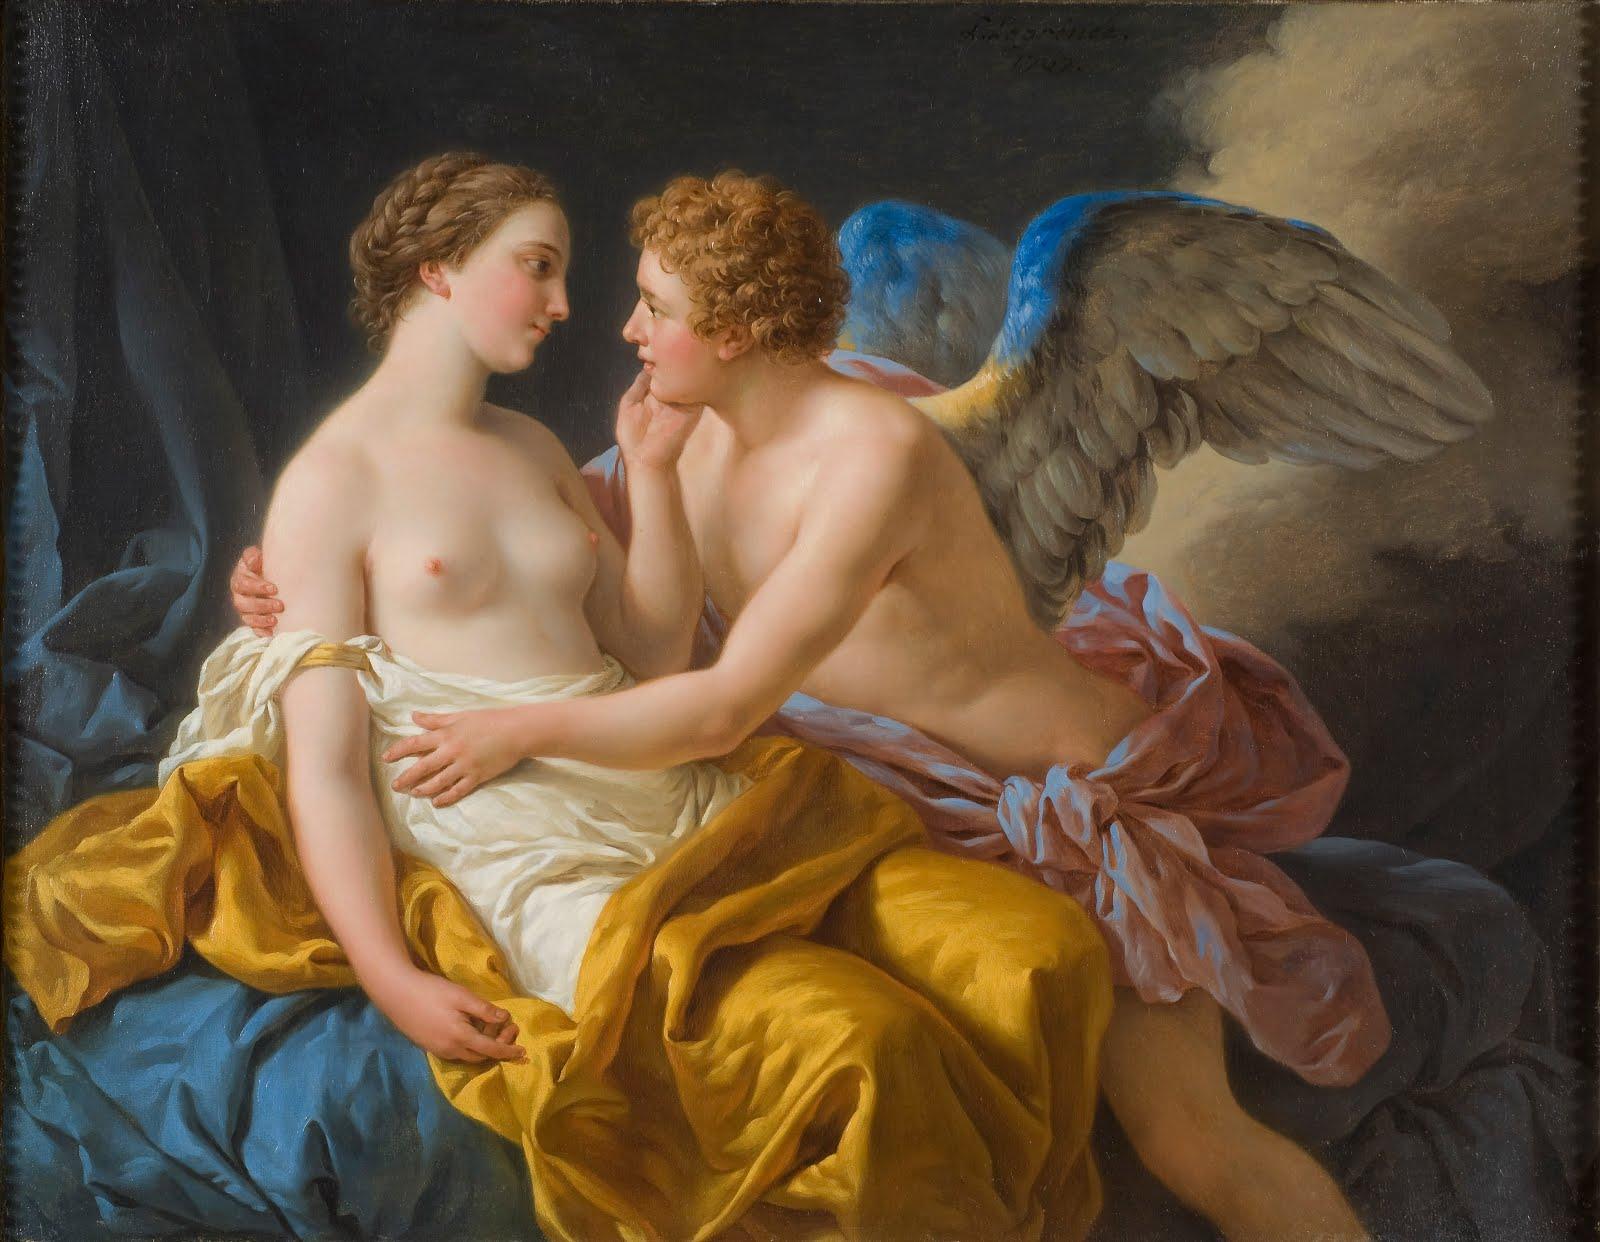 Louis_Jean_Francois_Lagren_e___Amor_and_Psyche_1_